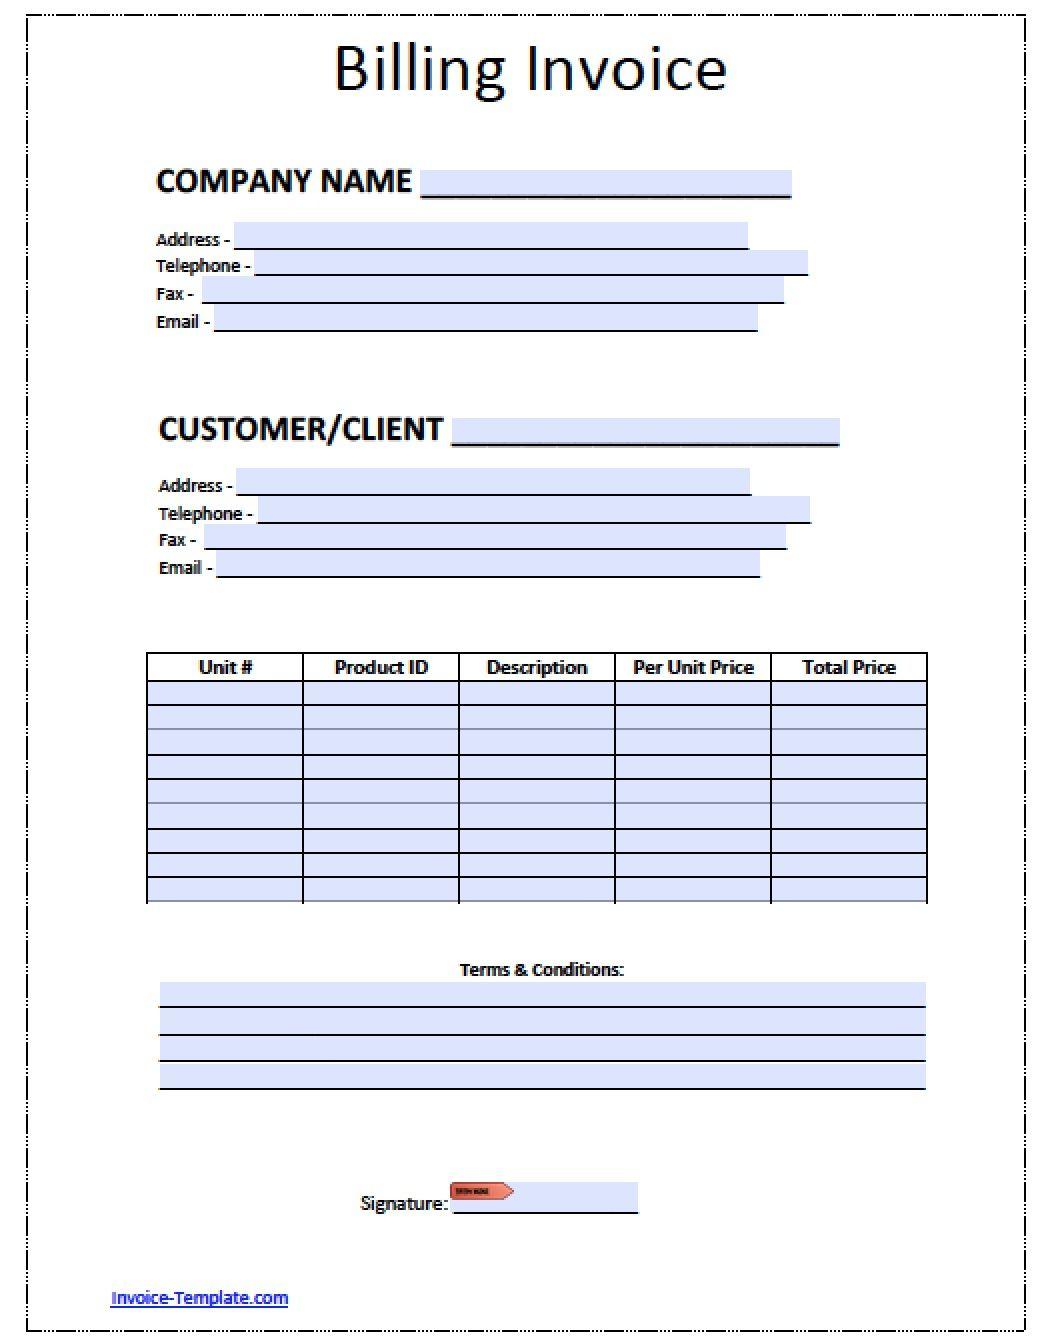 Billing Invoice Templates 18 Free Printable Xlsx Docs Format Invoice Template Word Invoice Template Printable Invoice